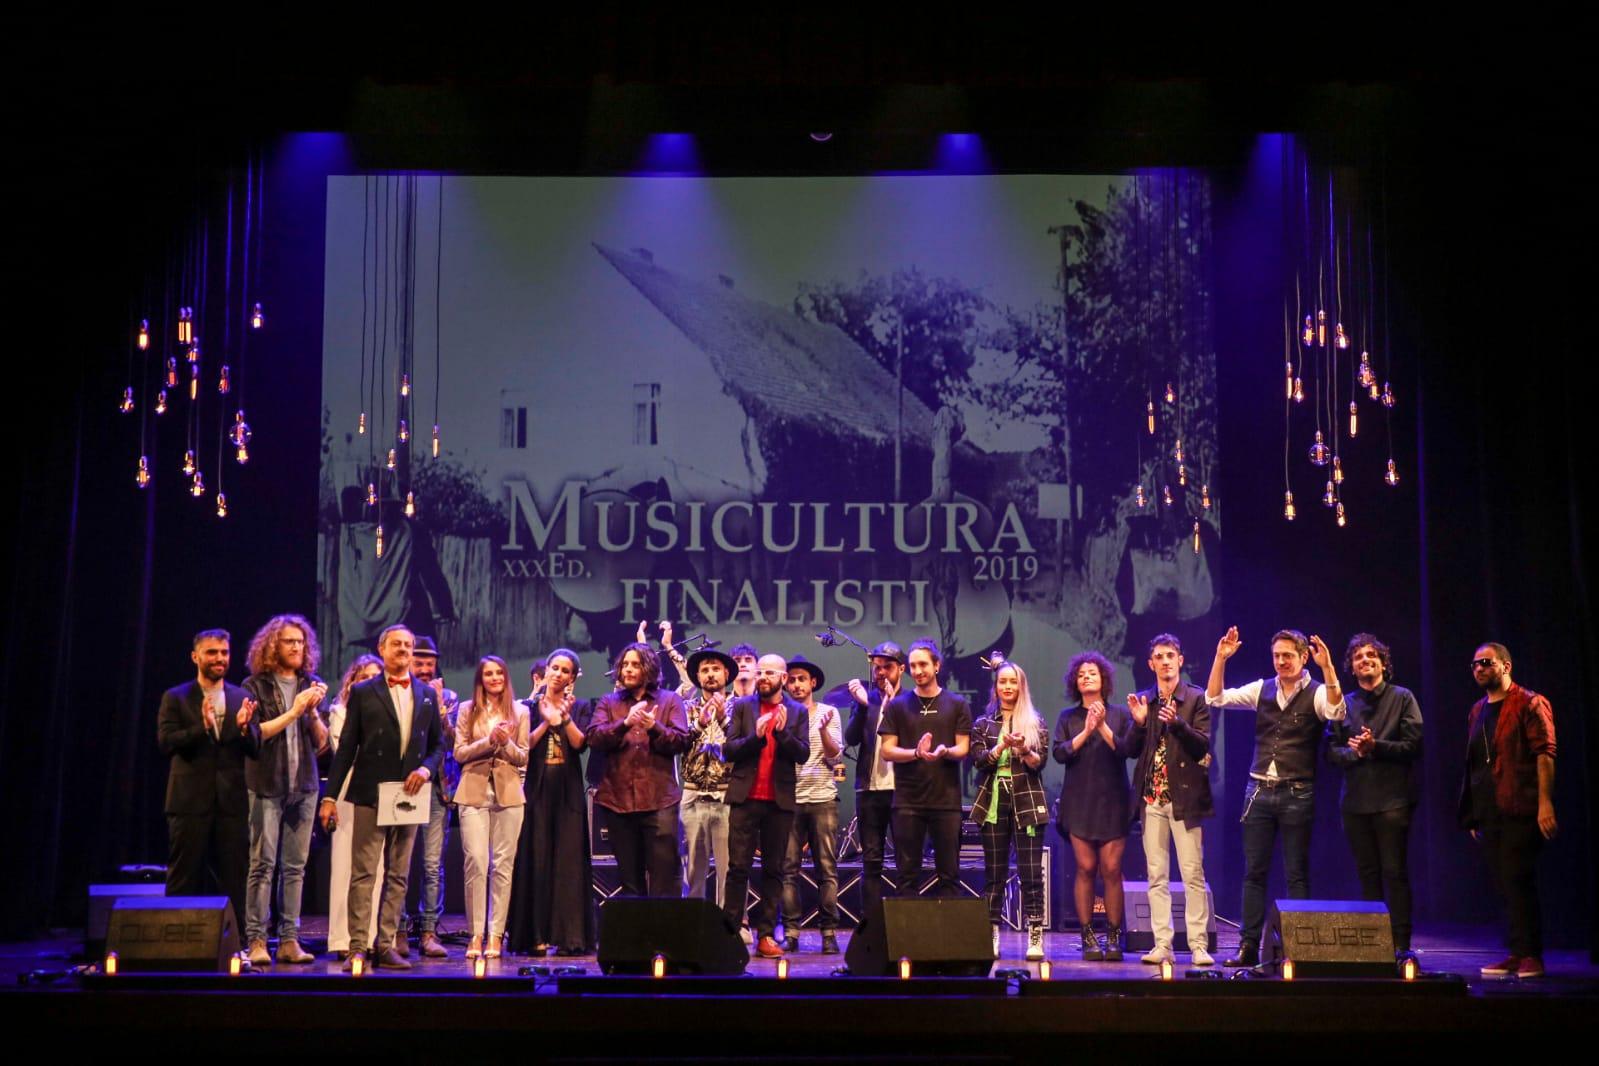 Musicultura, in concerto a Recanati i finalisti e Gianluca Grignani